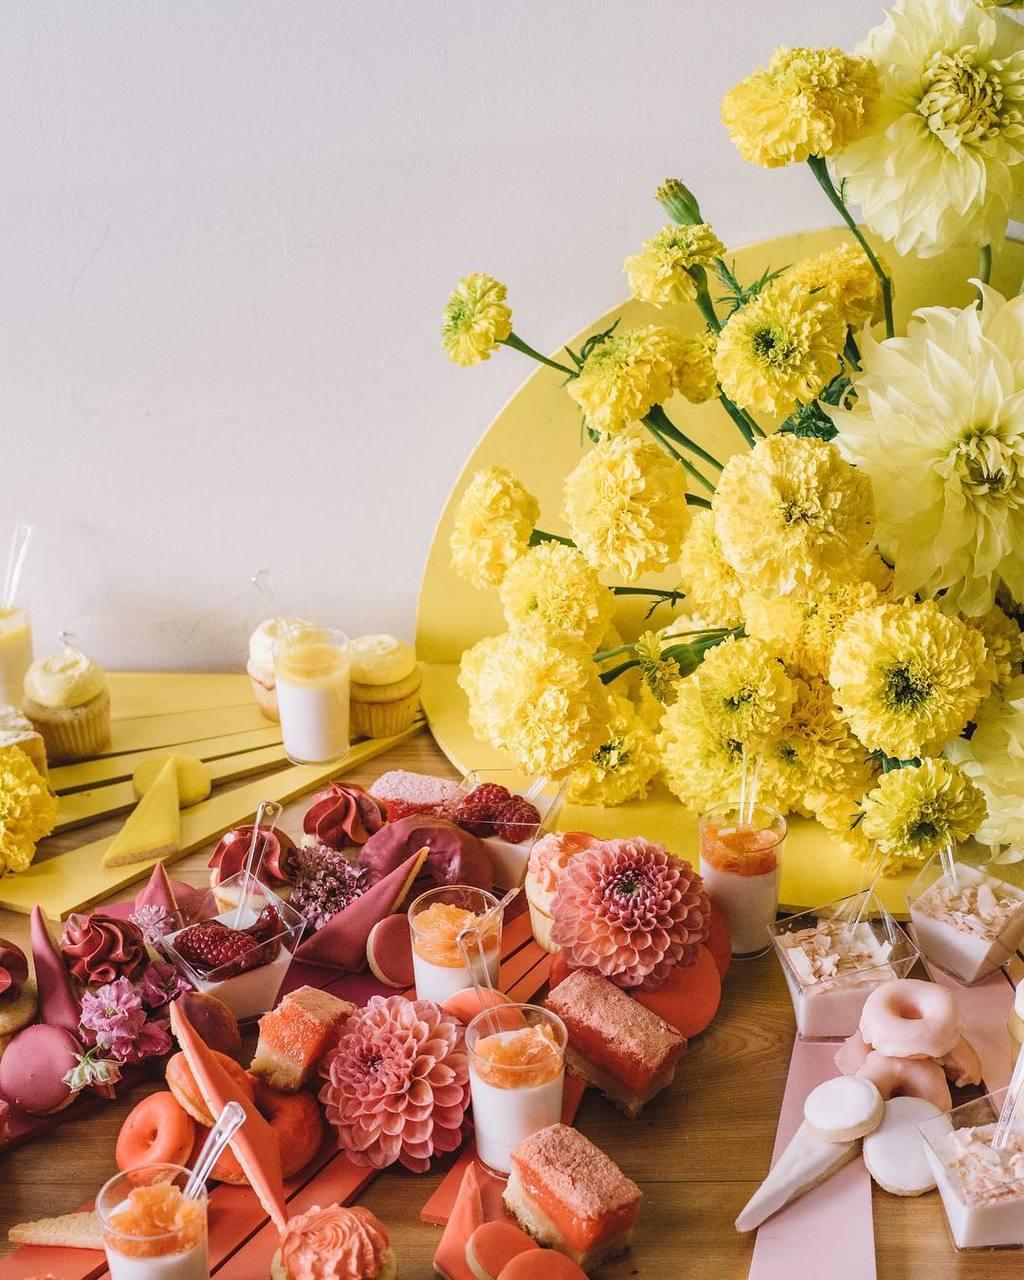 27 Unique Dessert Displays For Your Wedding...